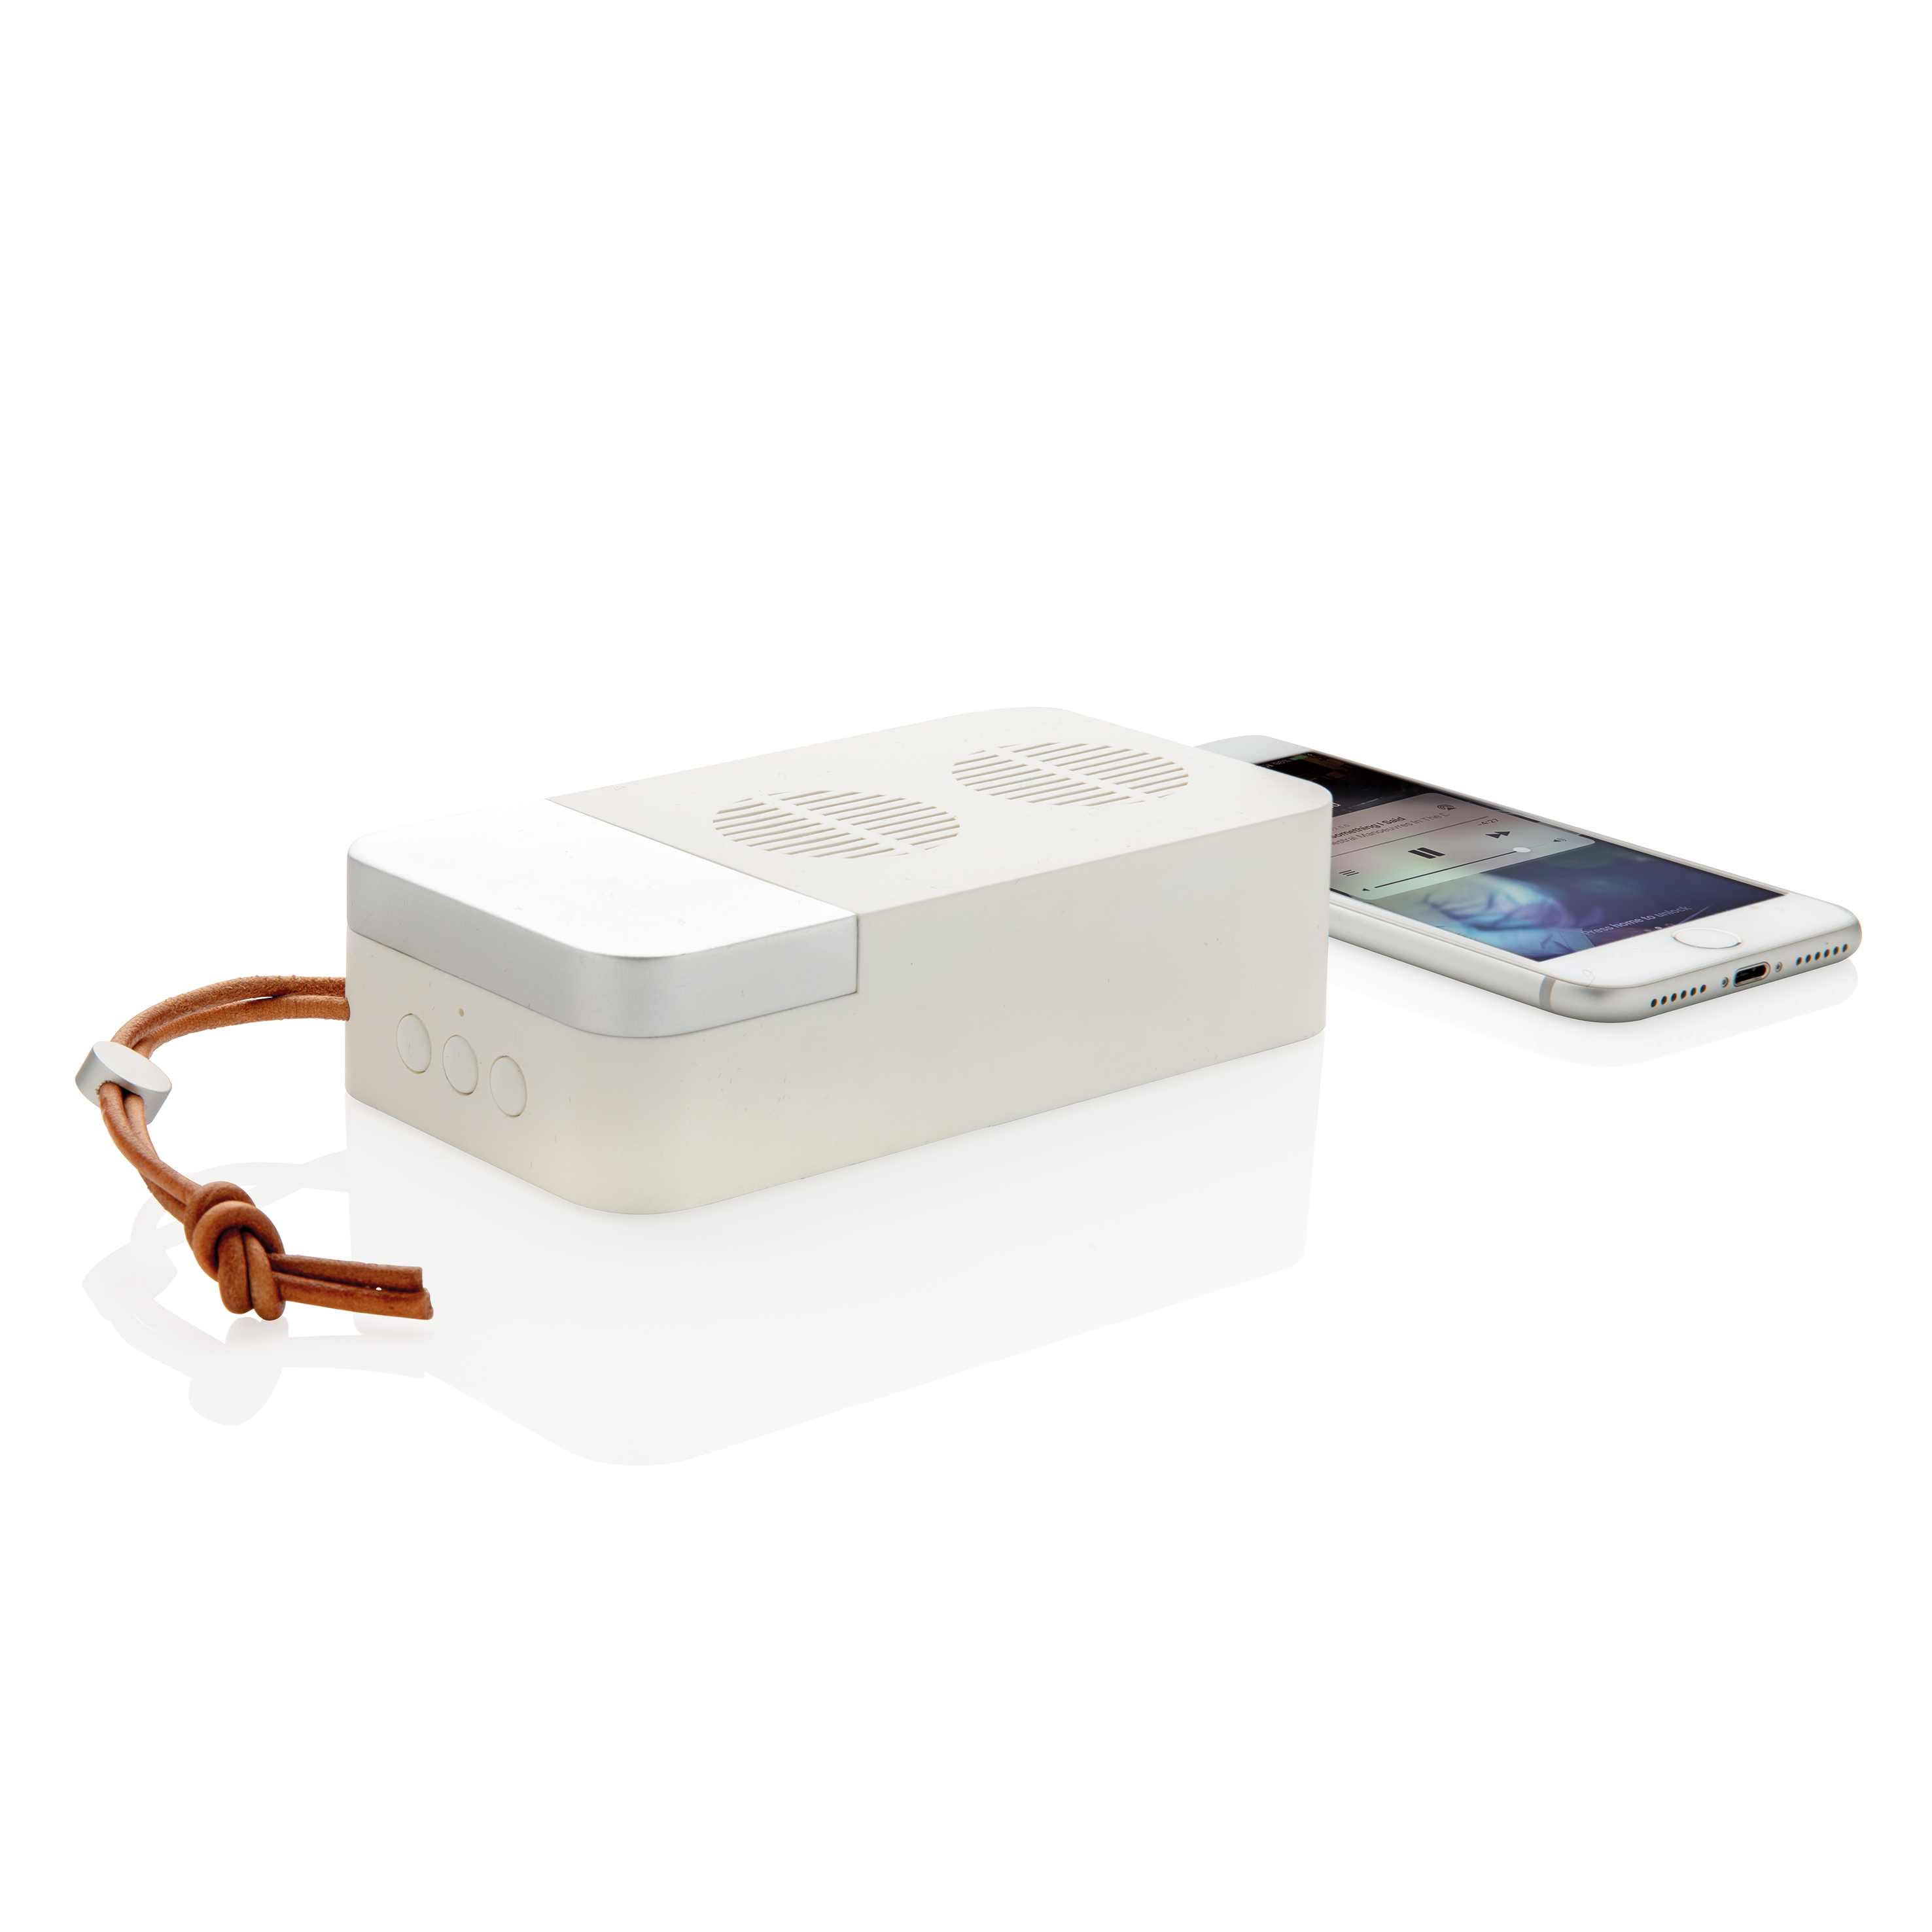 Enceinte portable 10W